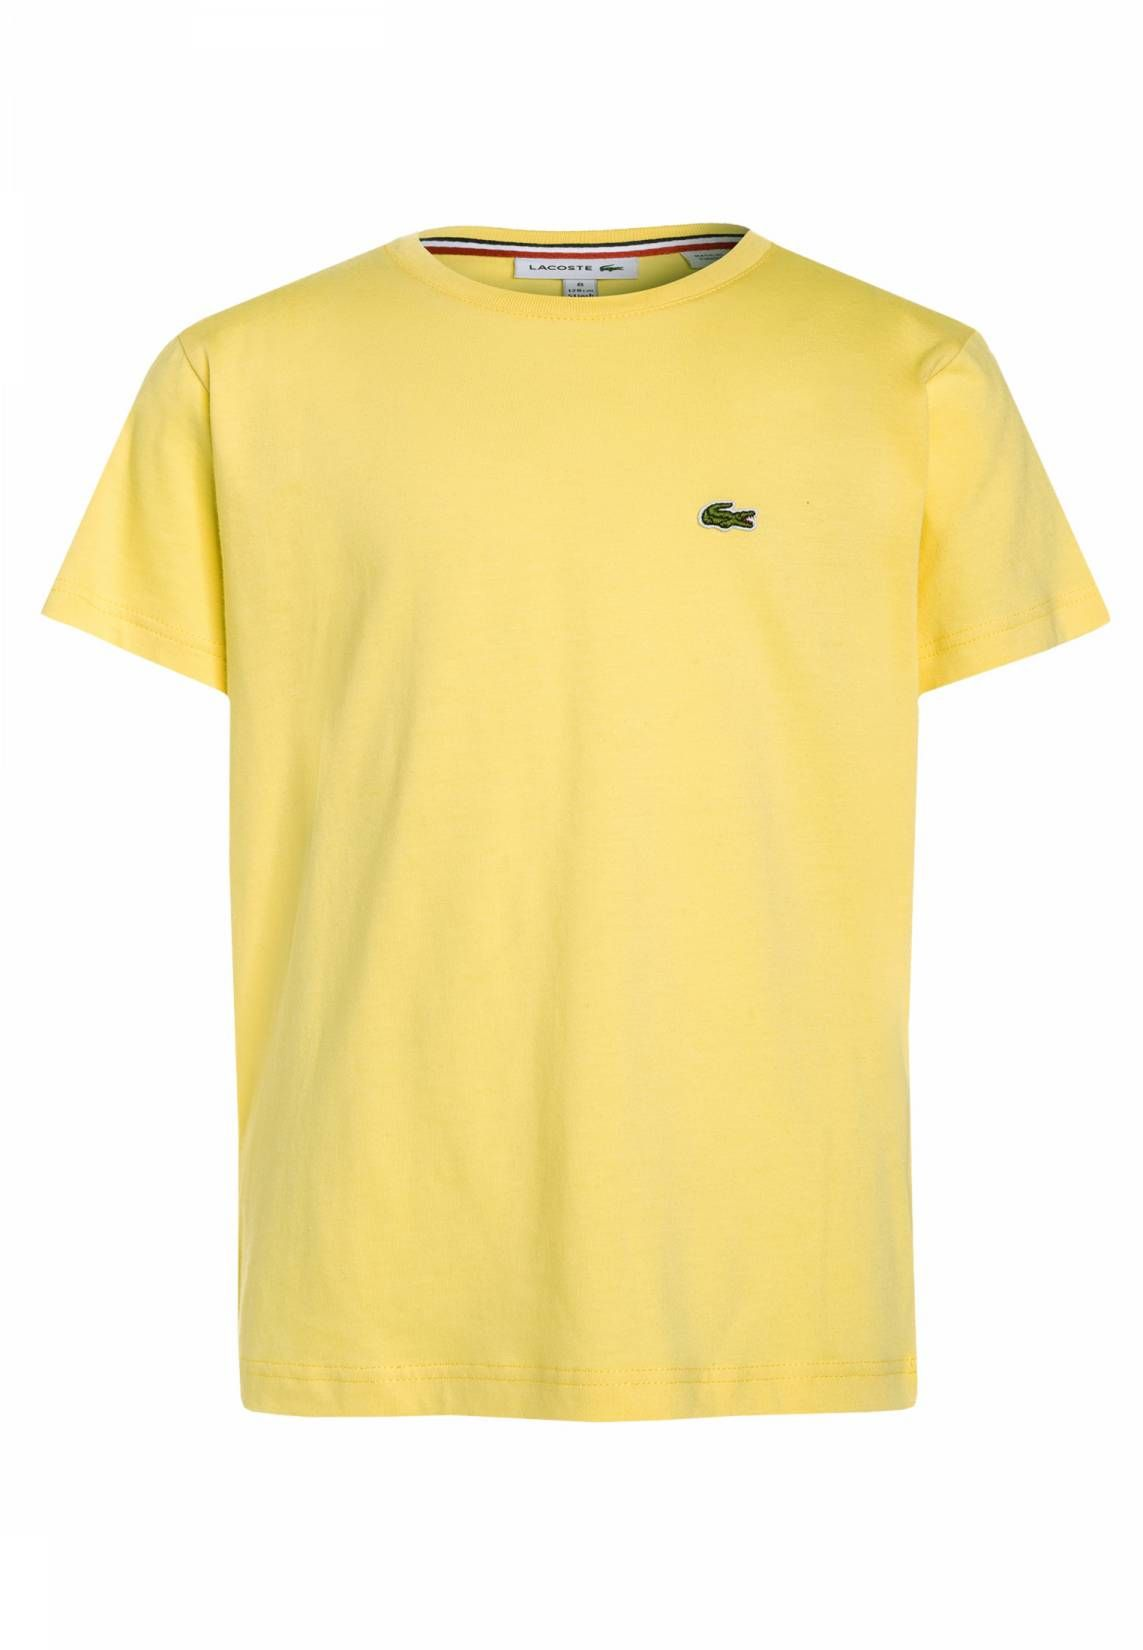 d6b5fe5e8 Lacoste. T-shirt basic - light. Avvertenze Lavaggio a macchina a 40 ...